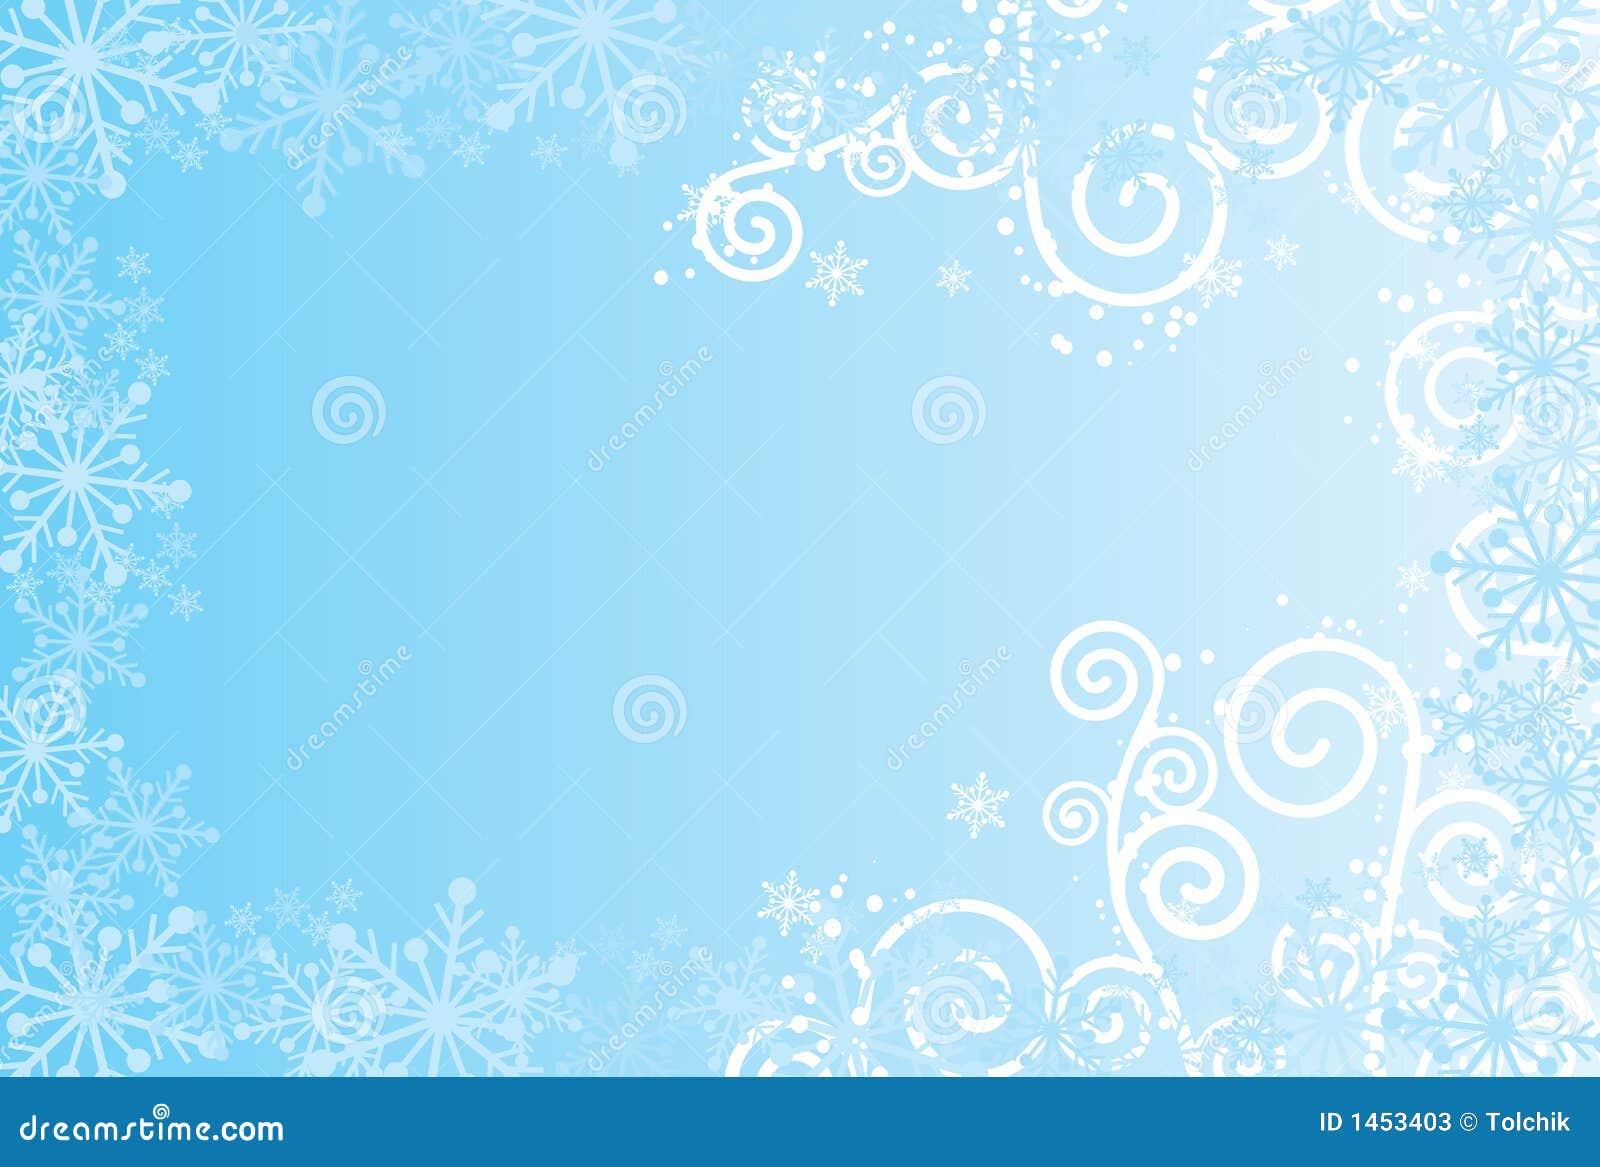 copos de nieve fondo  vector fotos de archivo imagen black and white snowflake clipart free white snowflake clipart no background